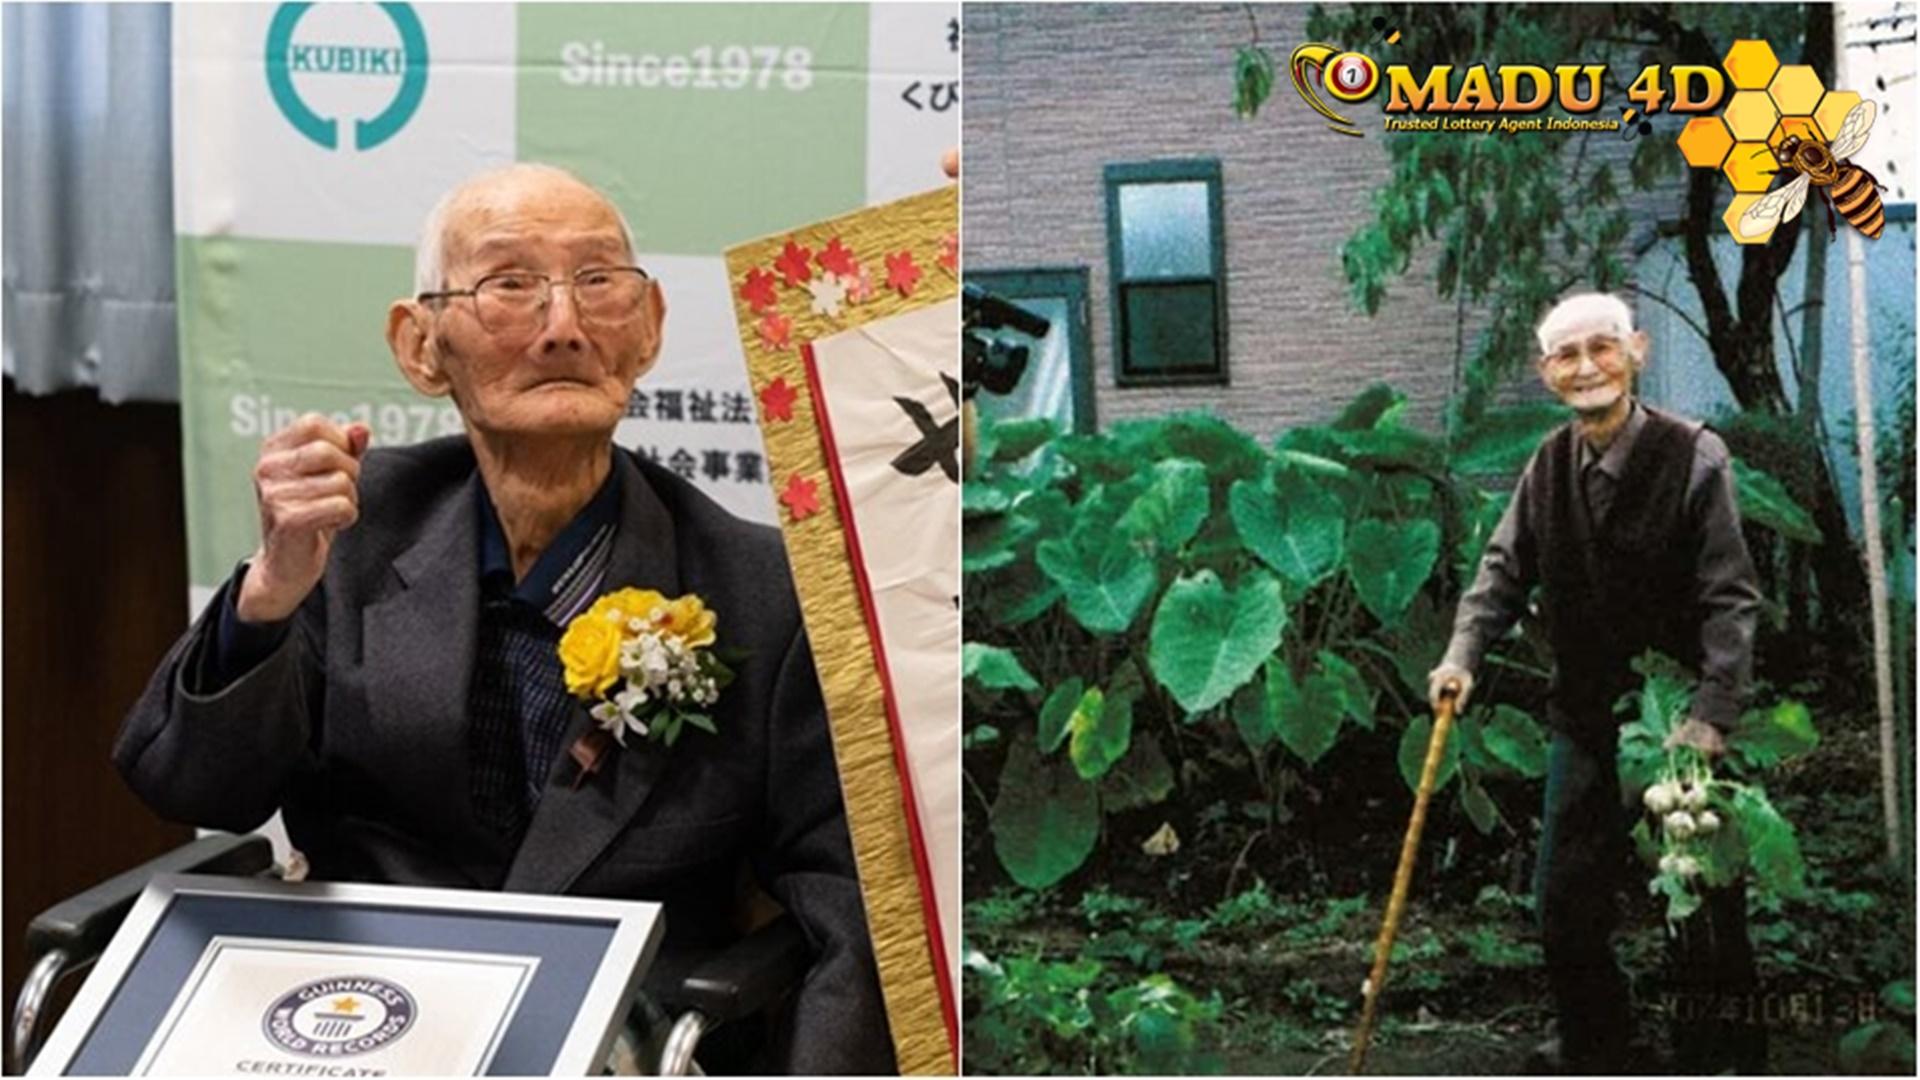 Resep Panjang Umur Chitetsu Watanabe yang Menginjak 112 Tahun